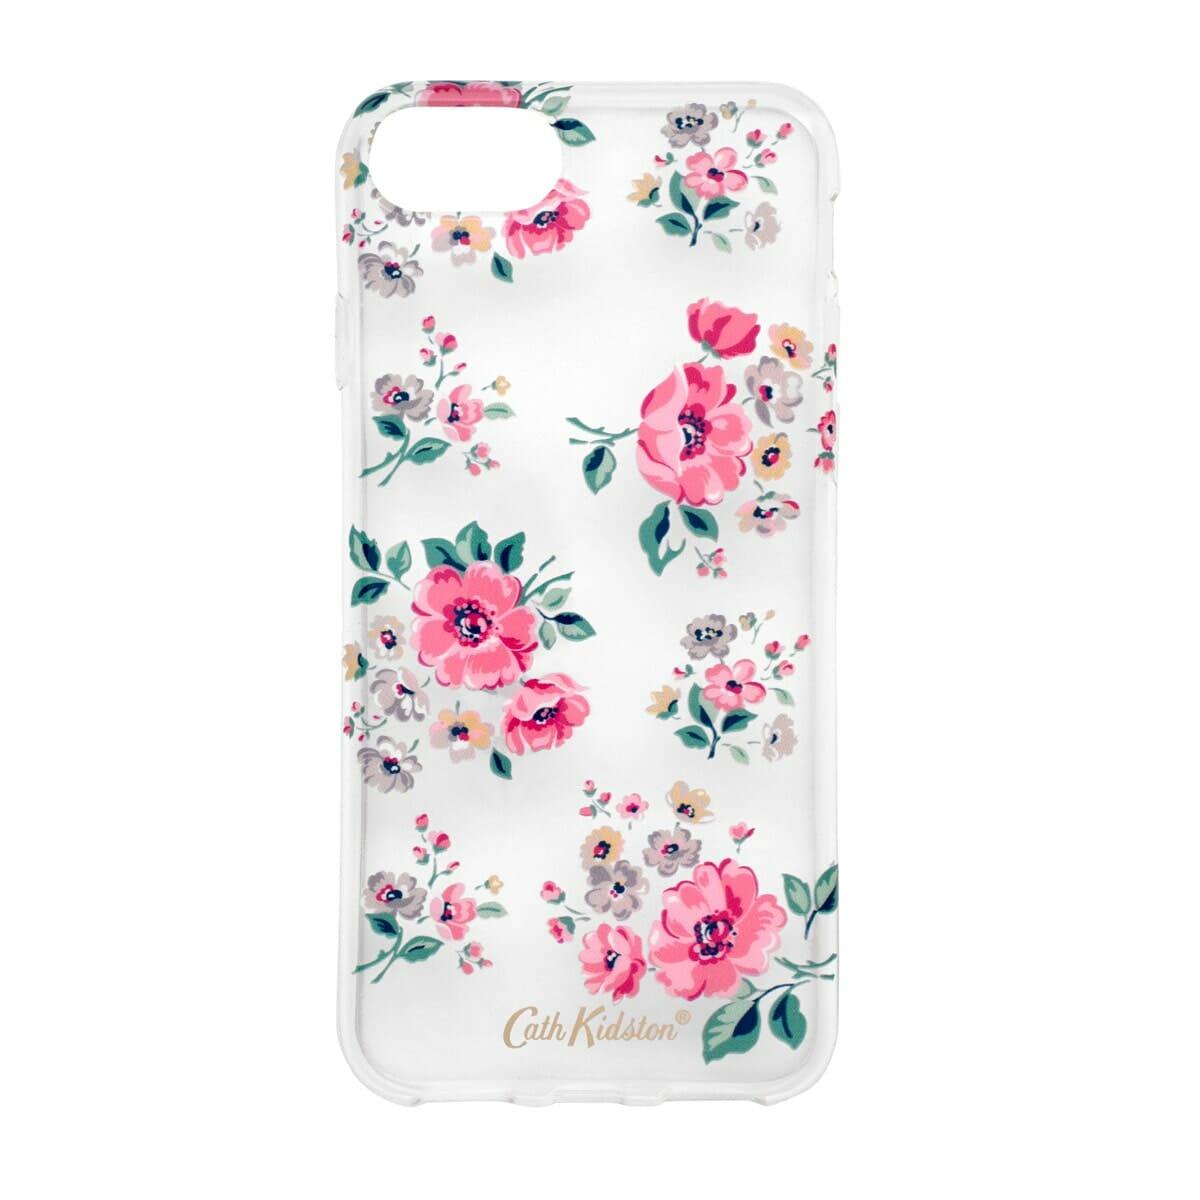 Cath Kidston Grove Bunch iPhone 6 7 8 Case - David Viggers Ltd ... dd616fa24c